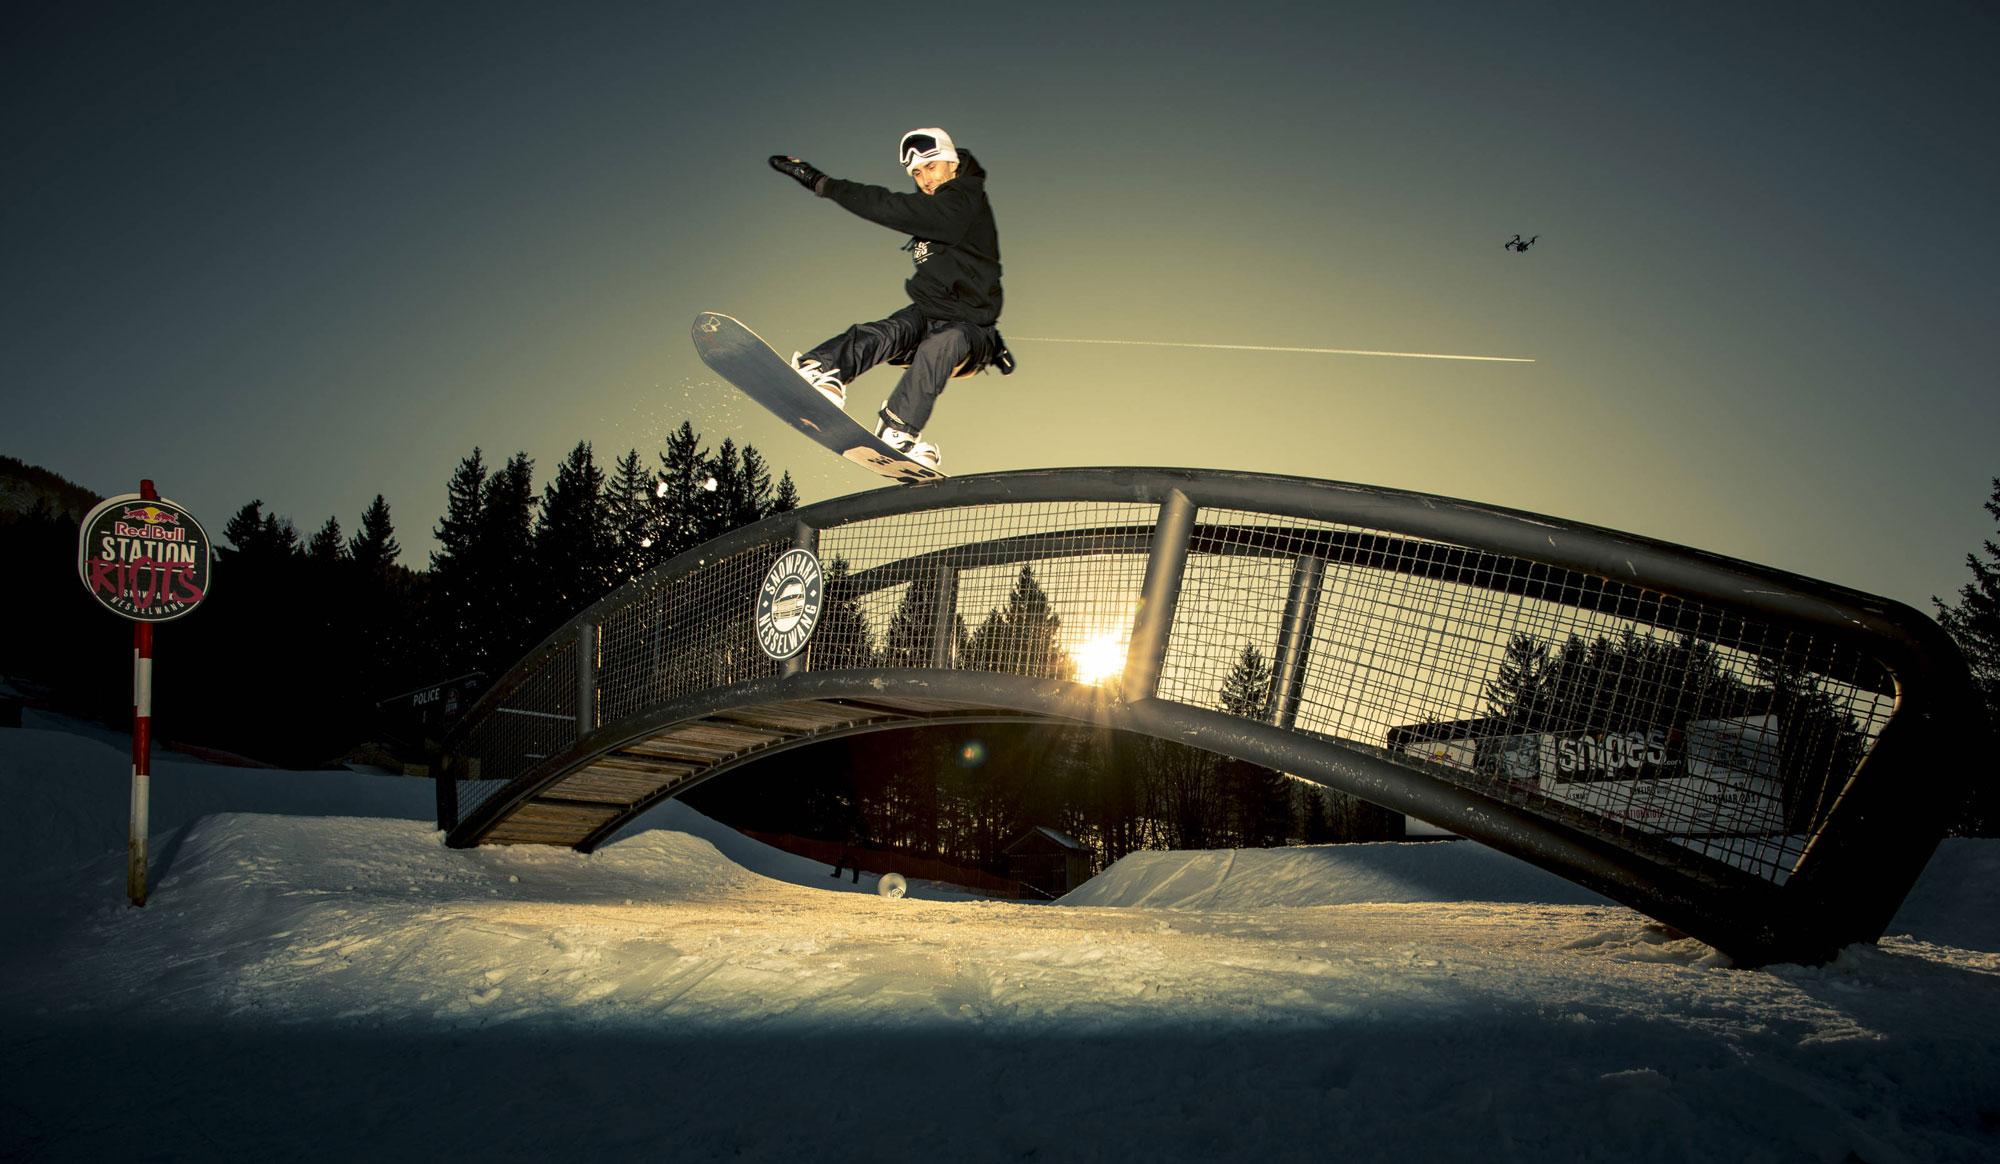 Dylan Norder. Photo: Lorenz Holder